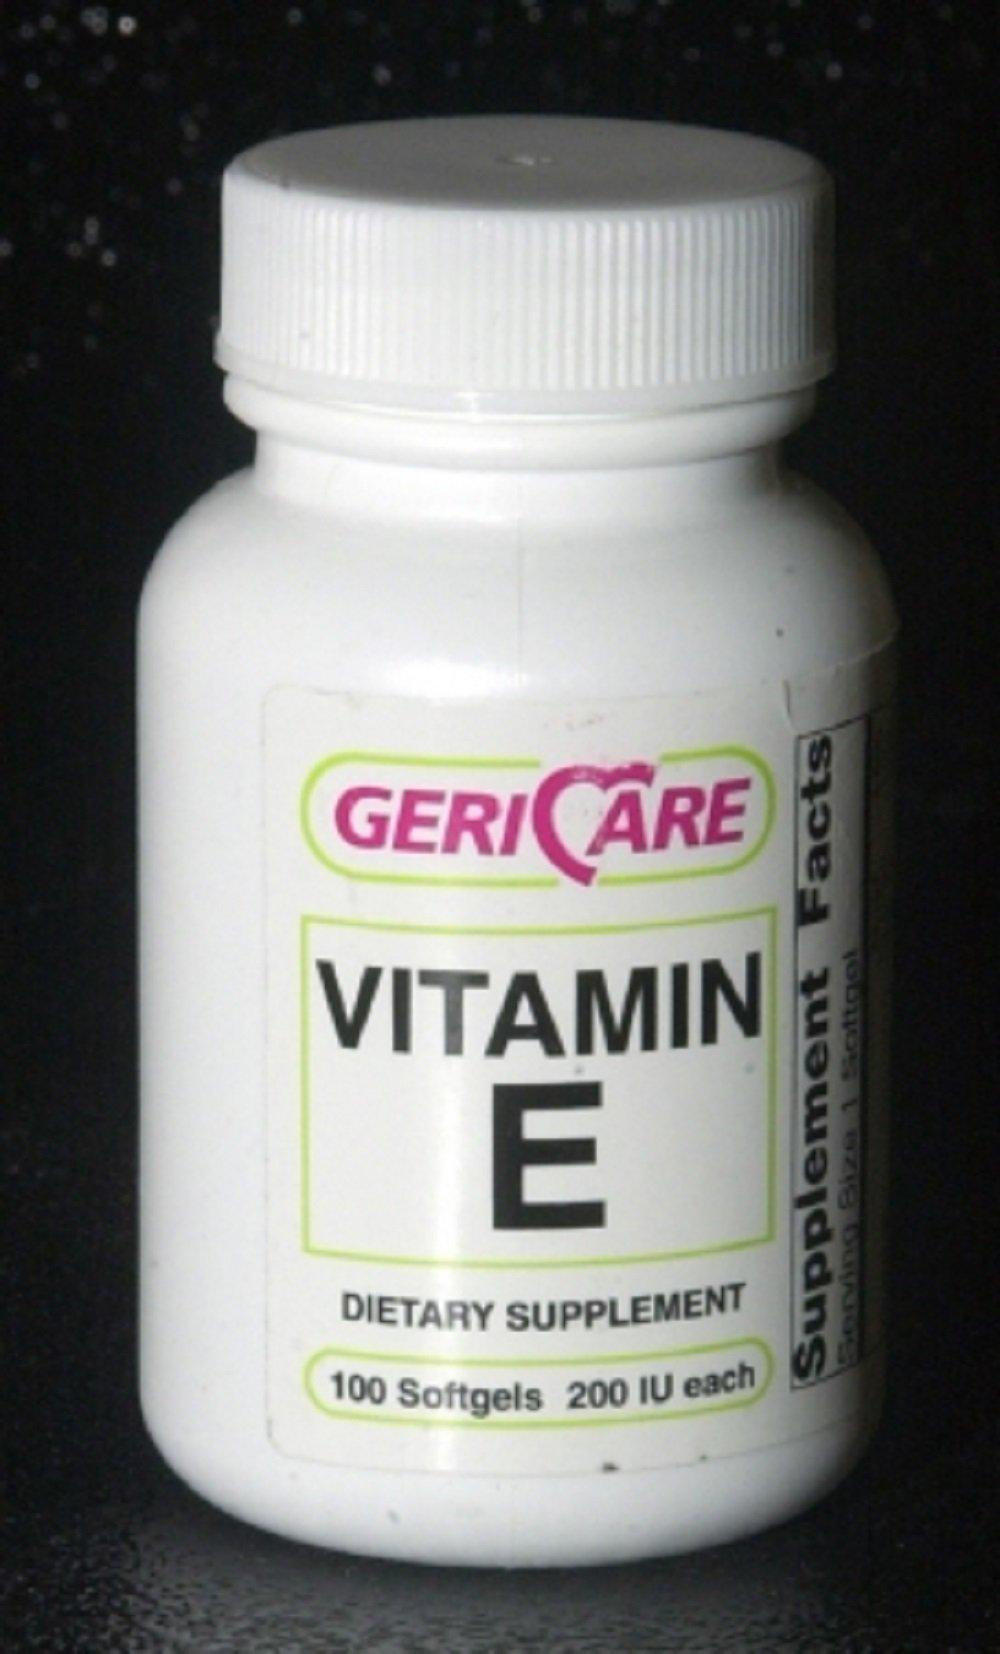 MCK75102710 - Mckesson Brand Vitamin E Supplement McKesson Brand 200 IU Strength Softgel